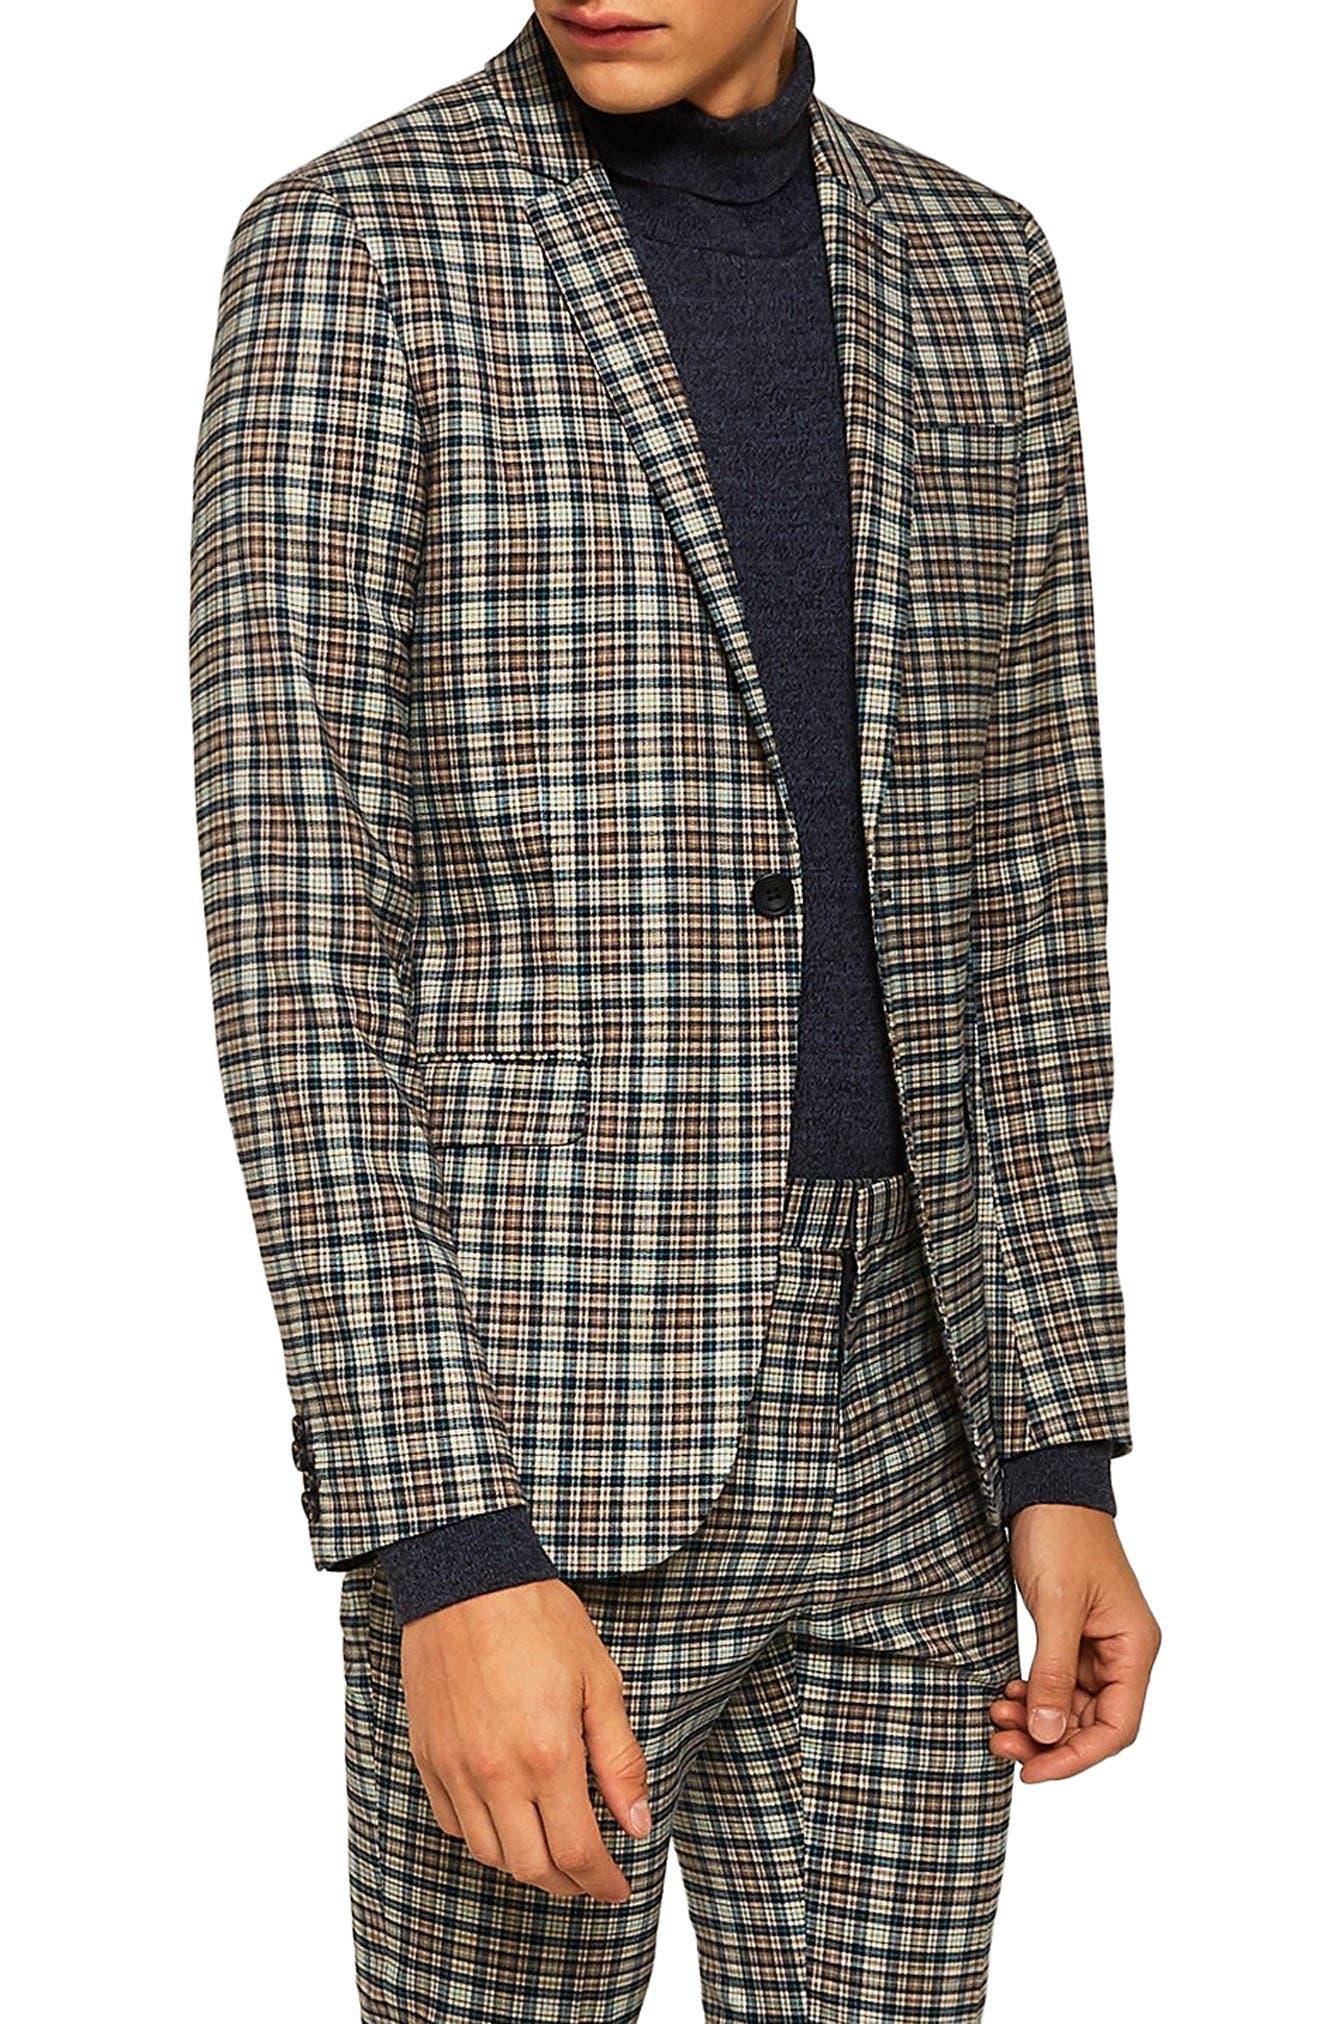 Ultra Skinny Fit Check Suit Jacket,                             Alternate thumbnail 3, color,                             BLACK MULTI